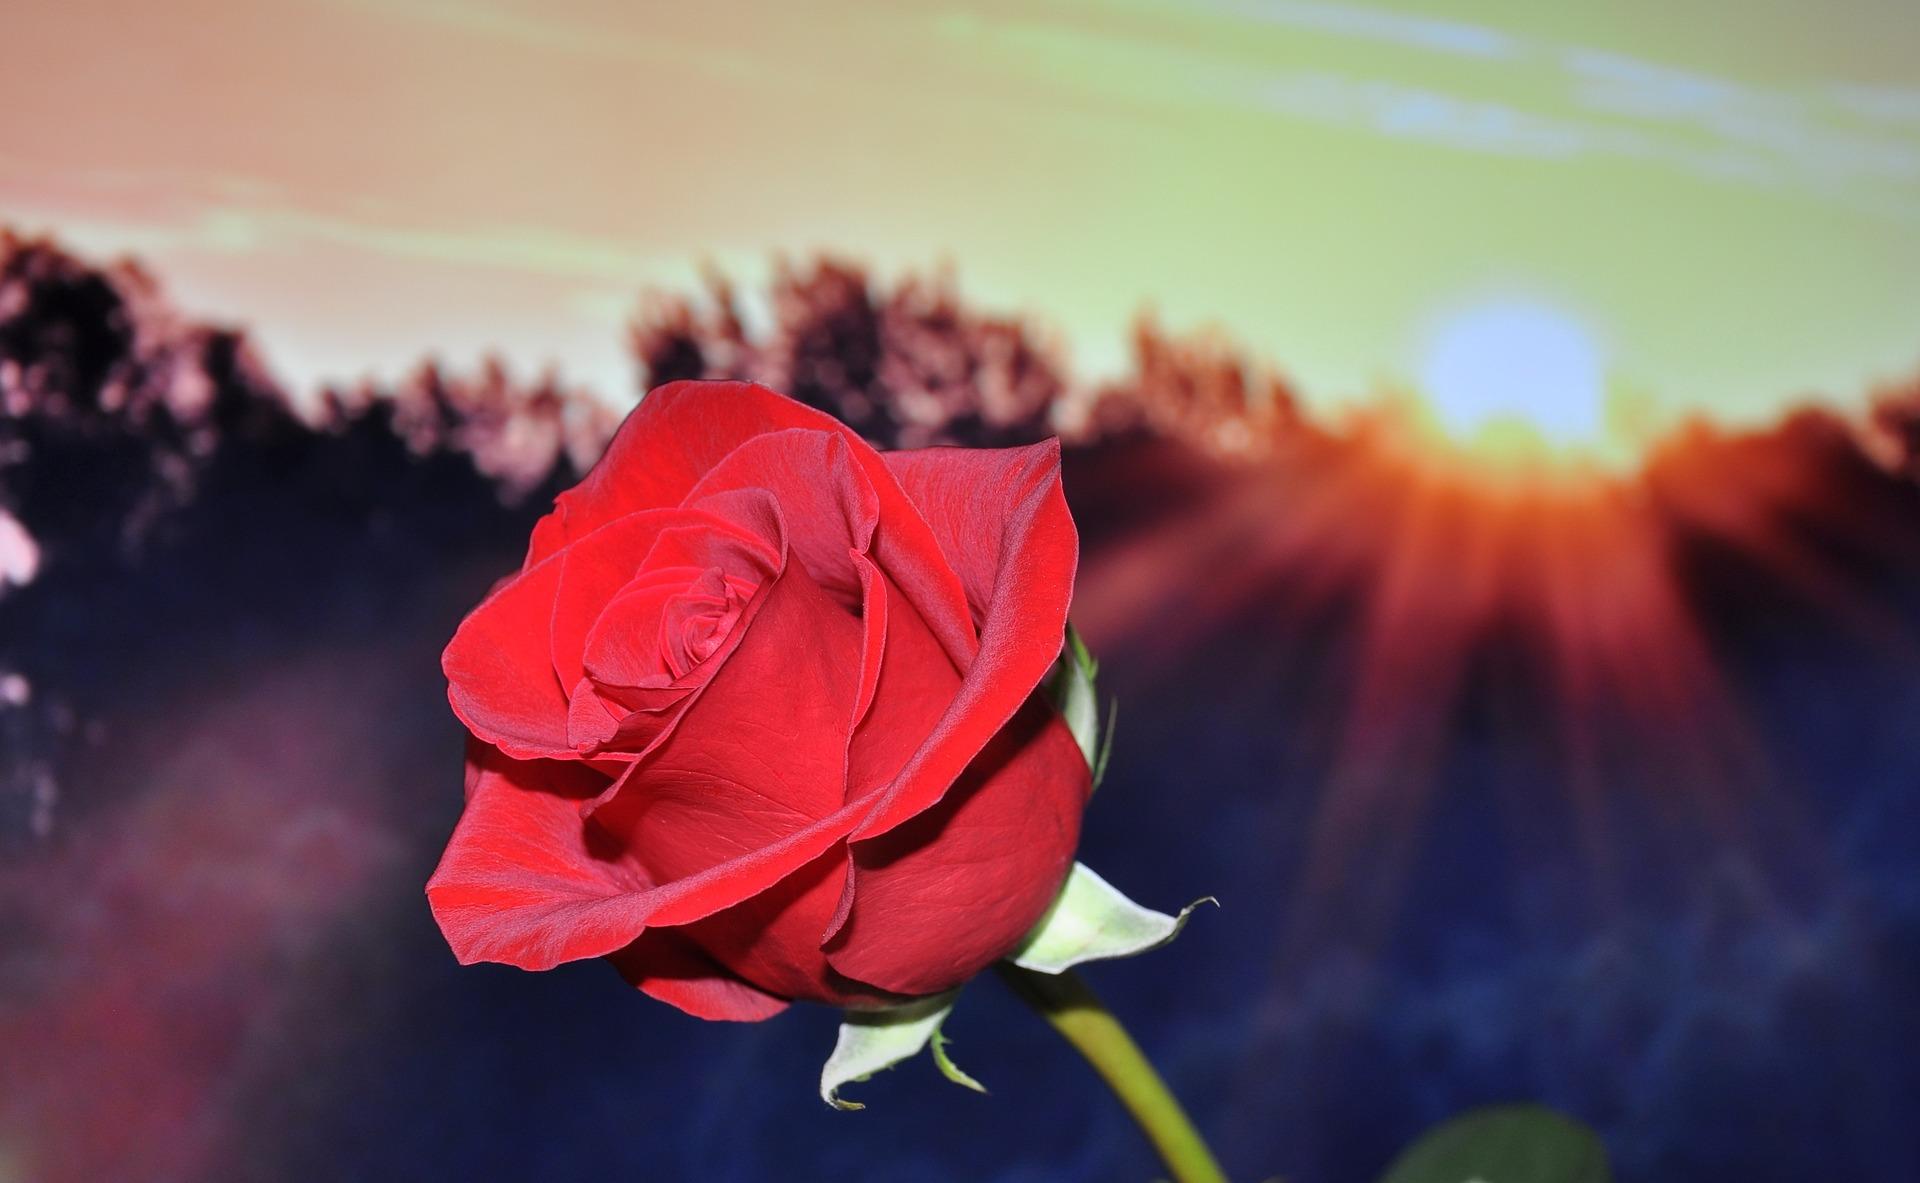 rose-670447_1920.jpg